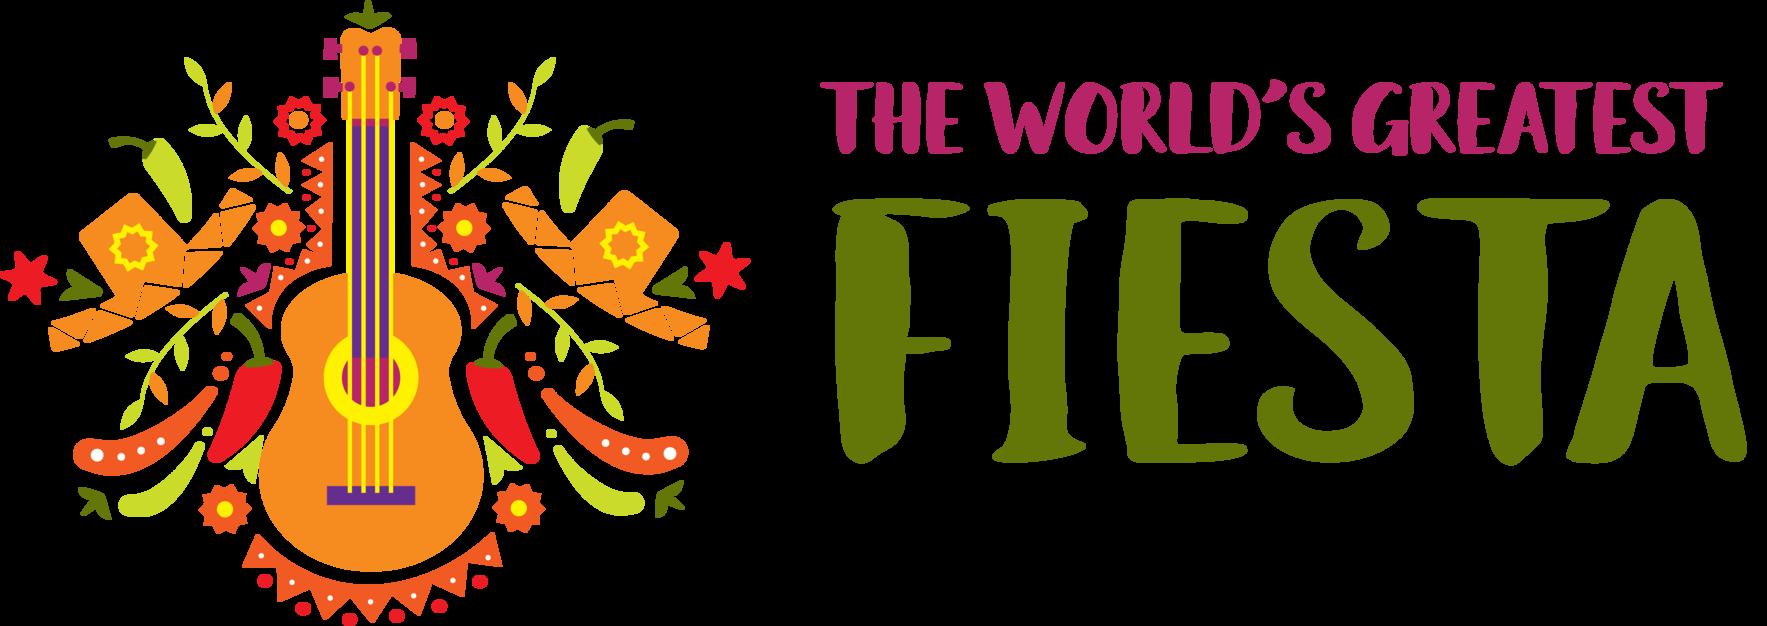 33rd Annual World's Greatest Fiesta image